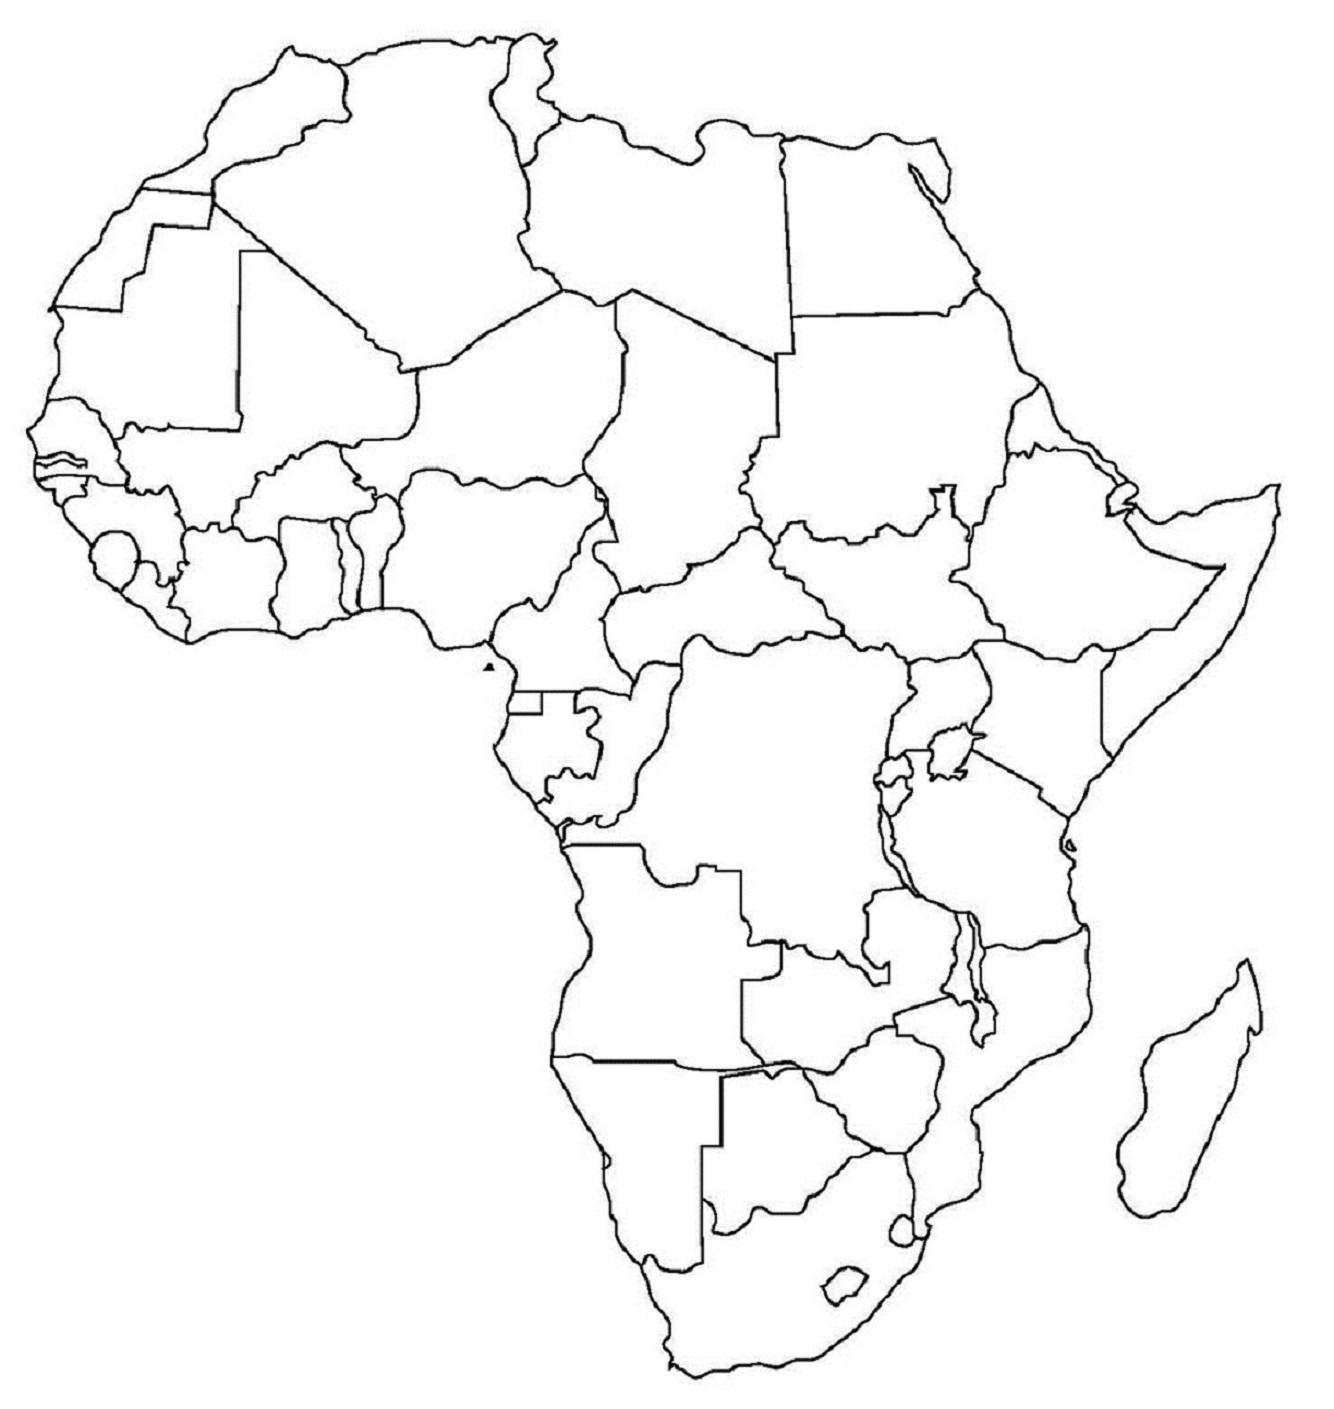 Africa Map Quiz Pdf - Africa map pdf